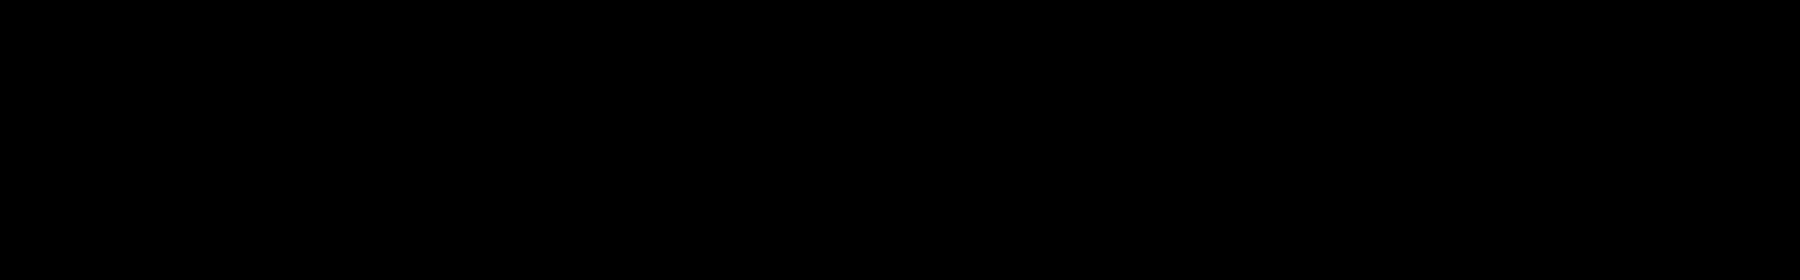 TRAP XII audio waveform